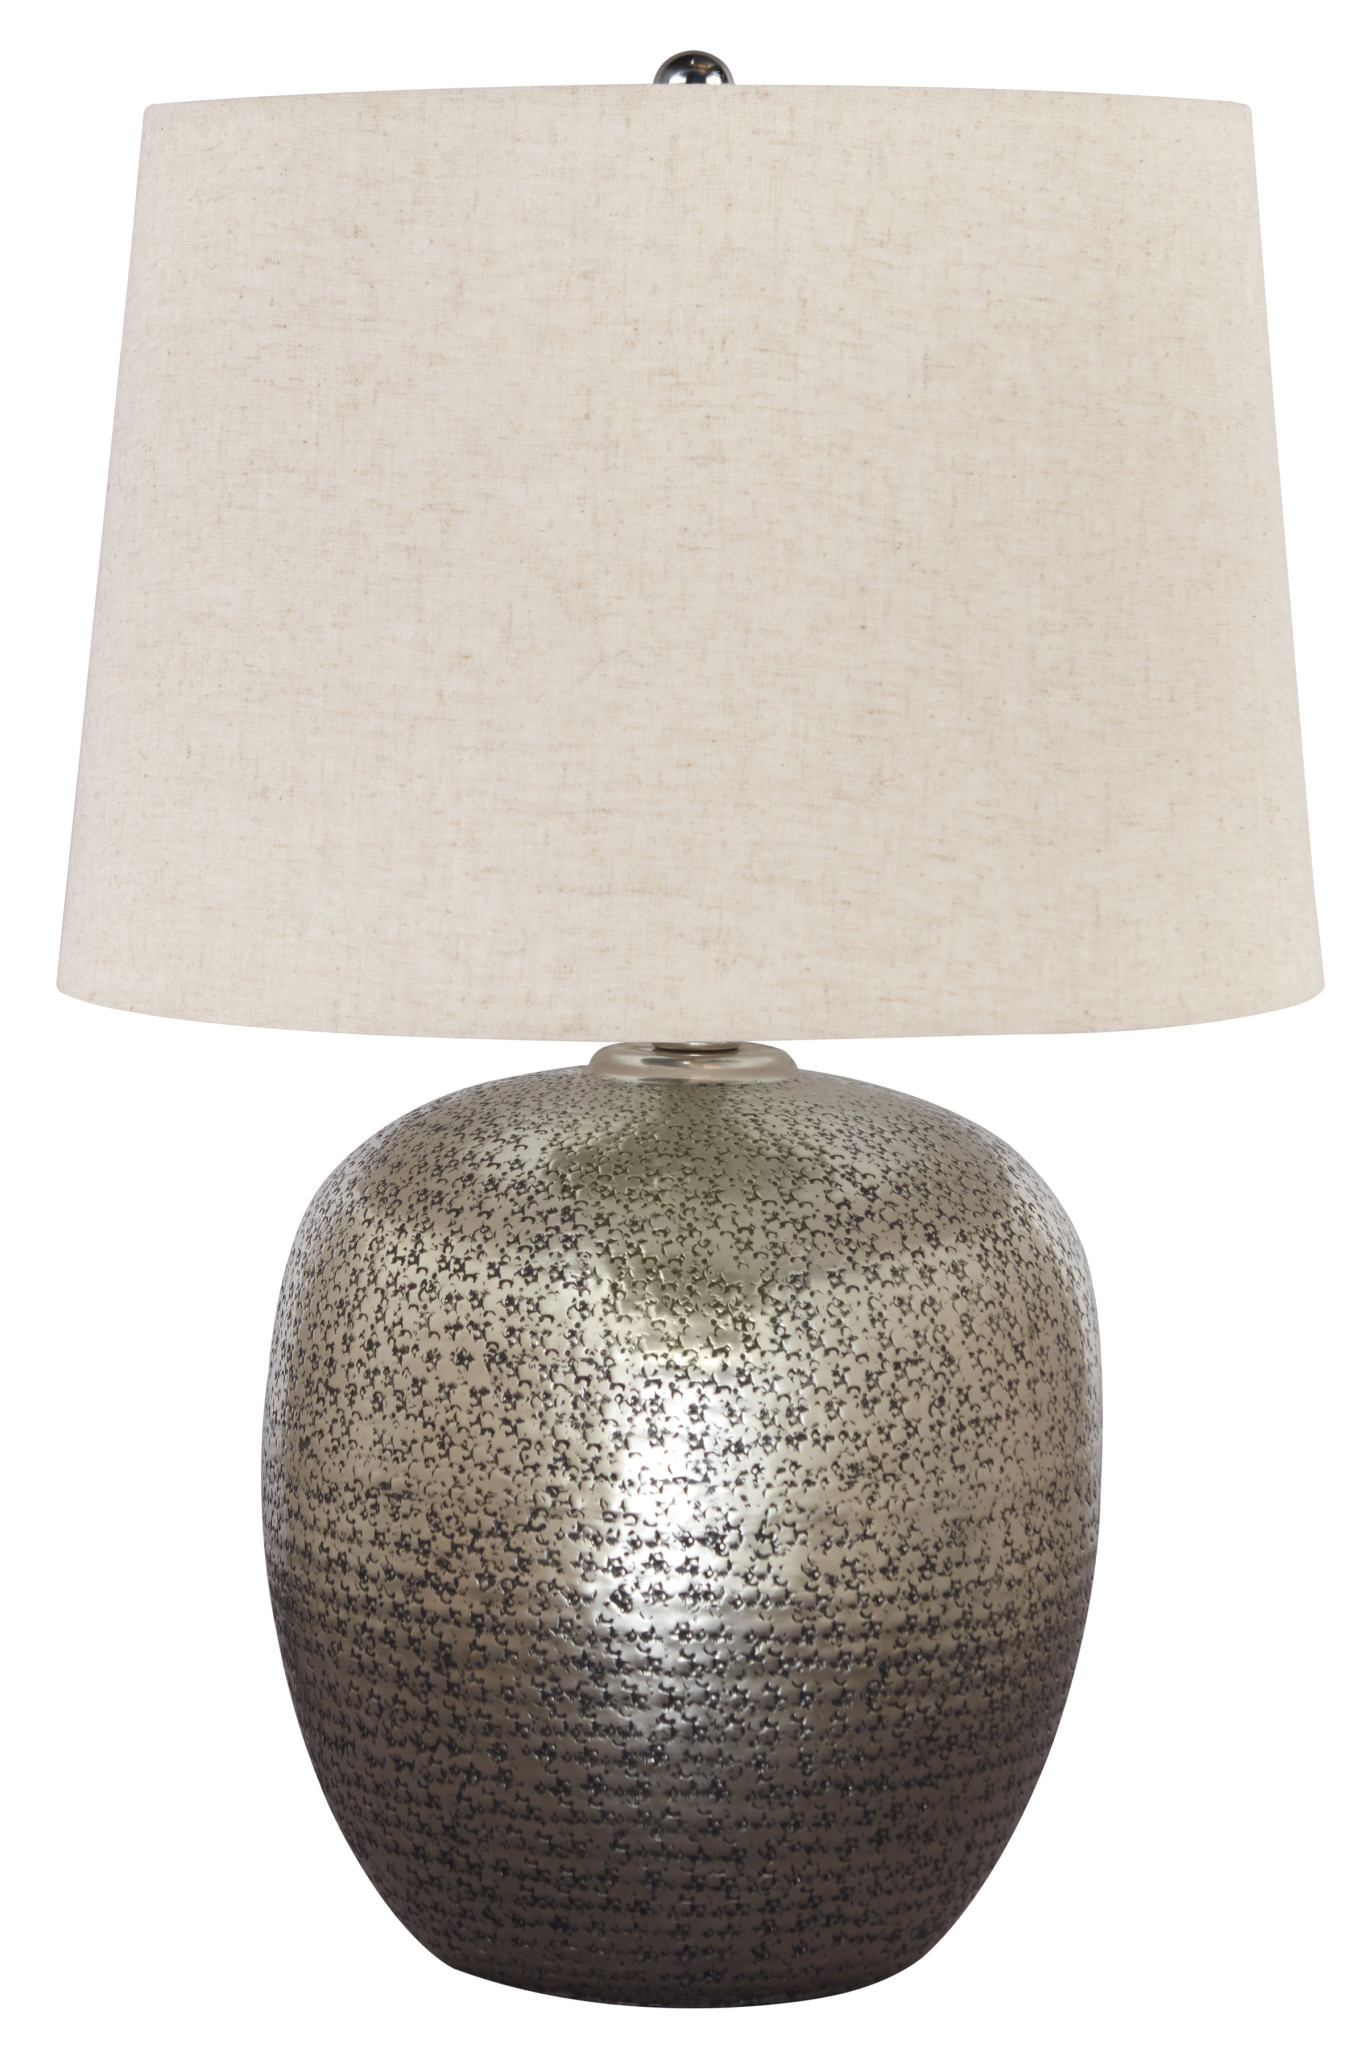 Signature Design Magalie Table Lamp- Antique Silver Finish- L207314